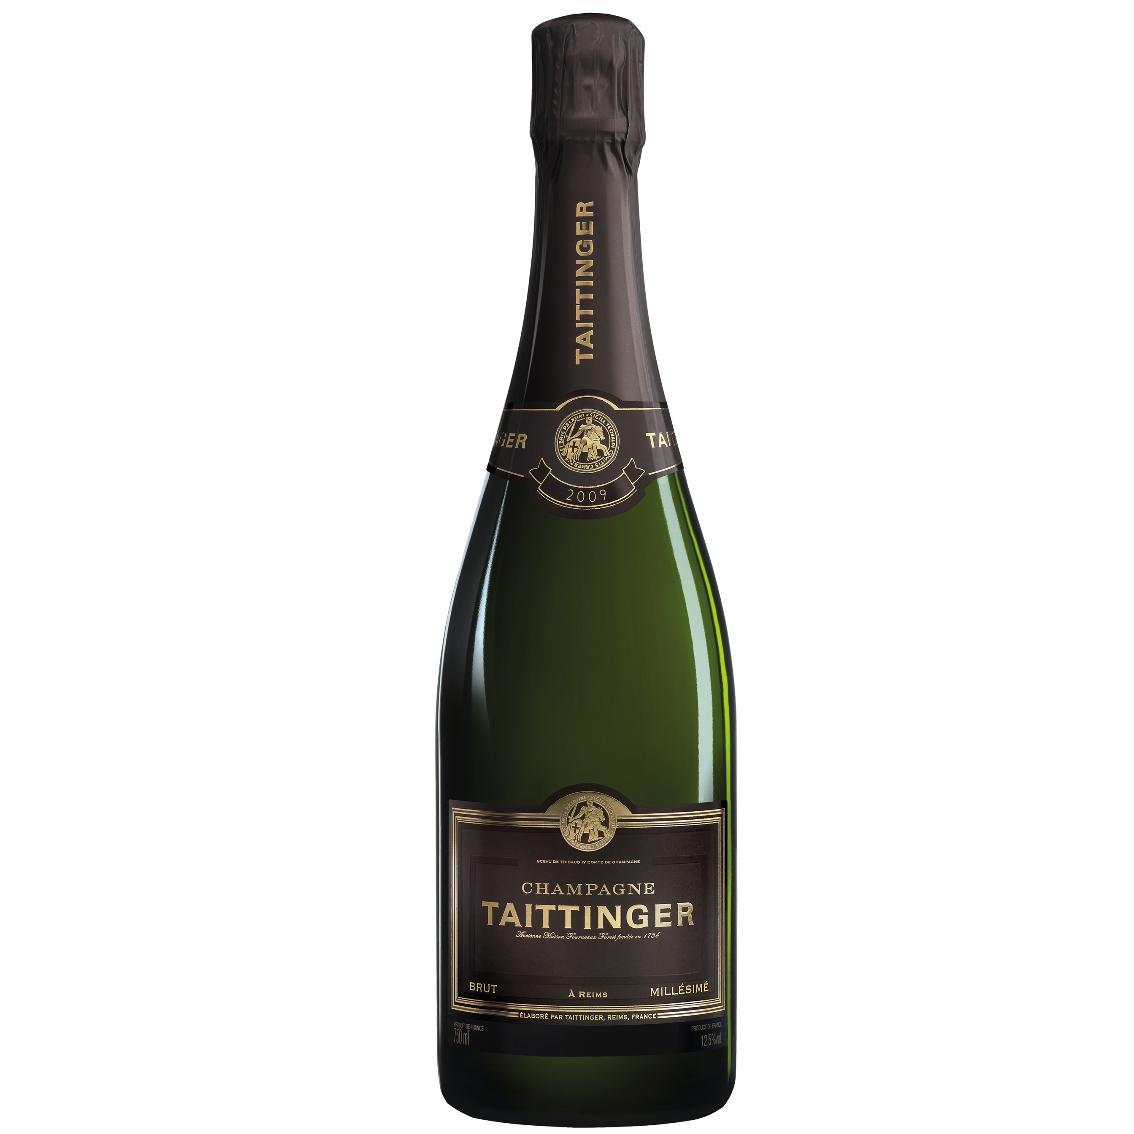 MAGNUM (1,5 l.) 2013 Taittinger Brut - Champagne